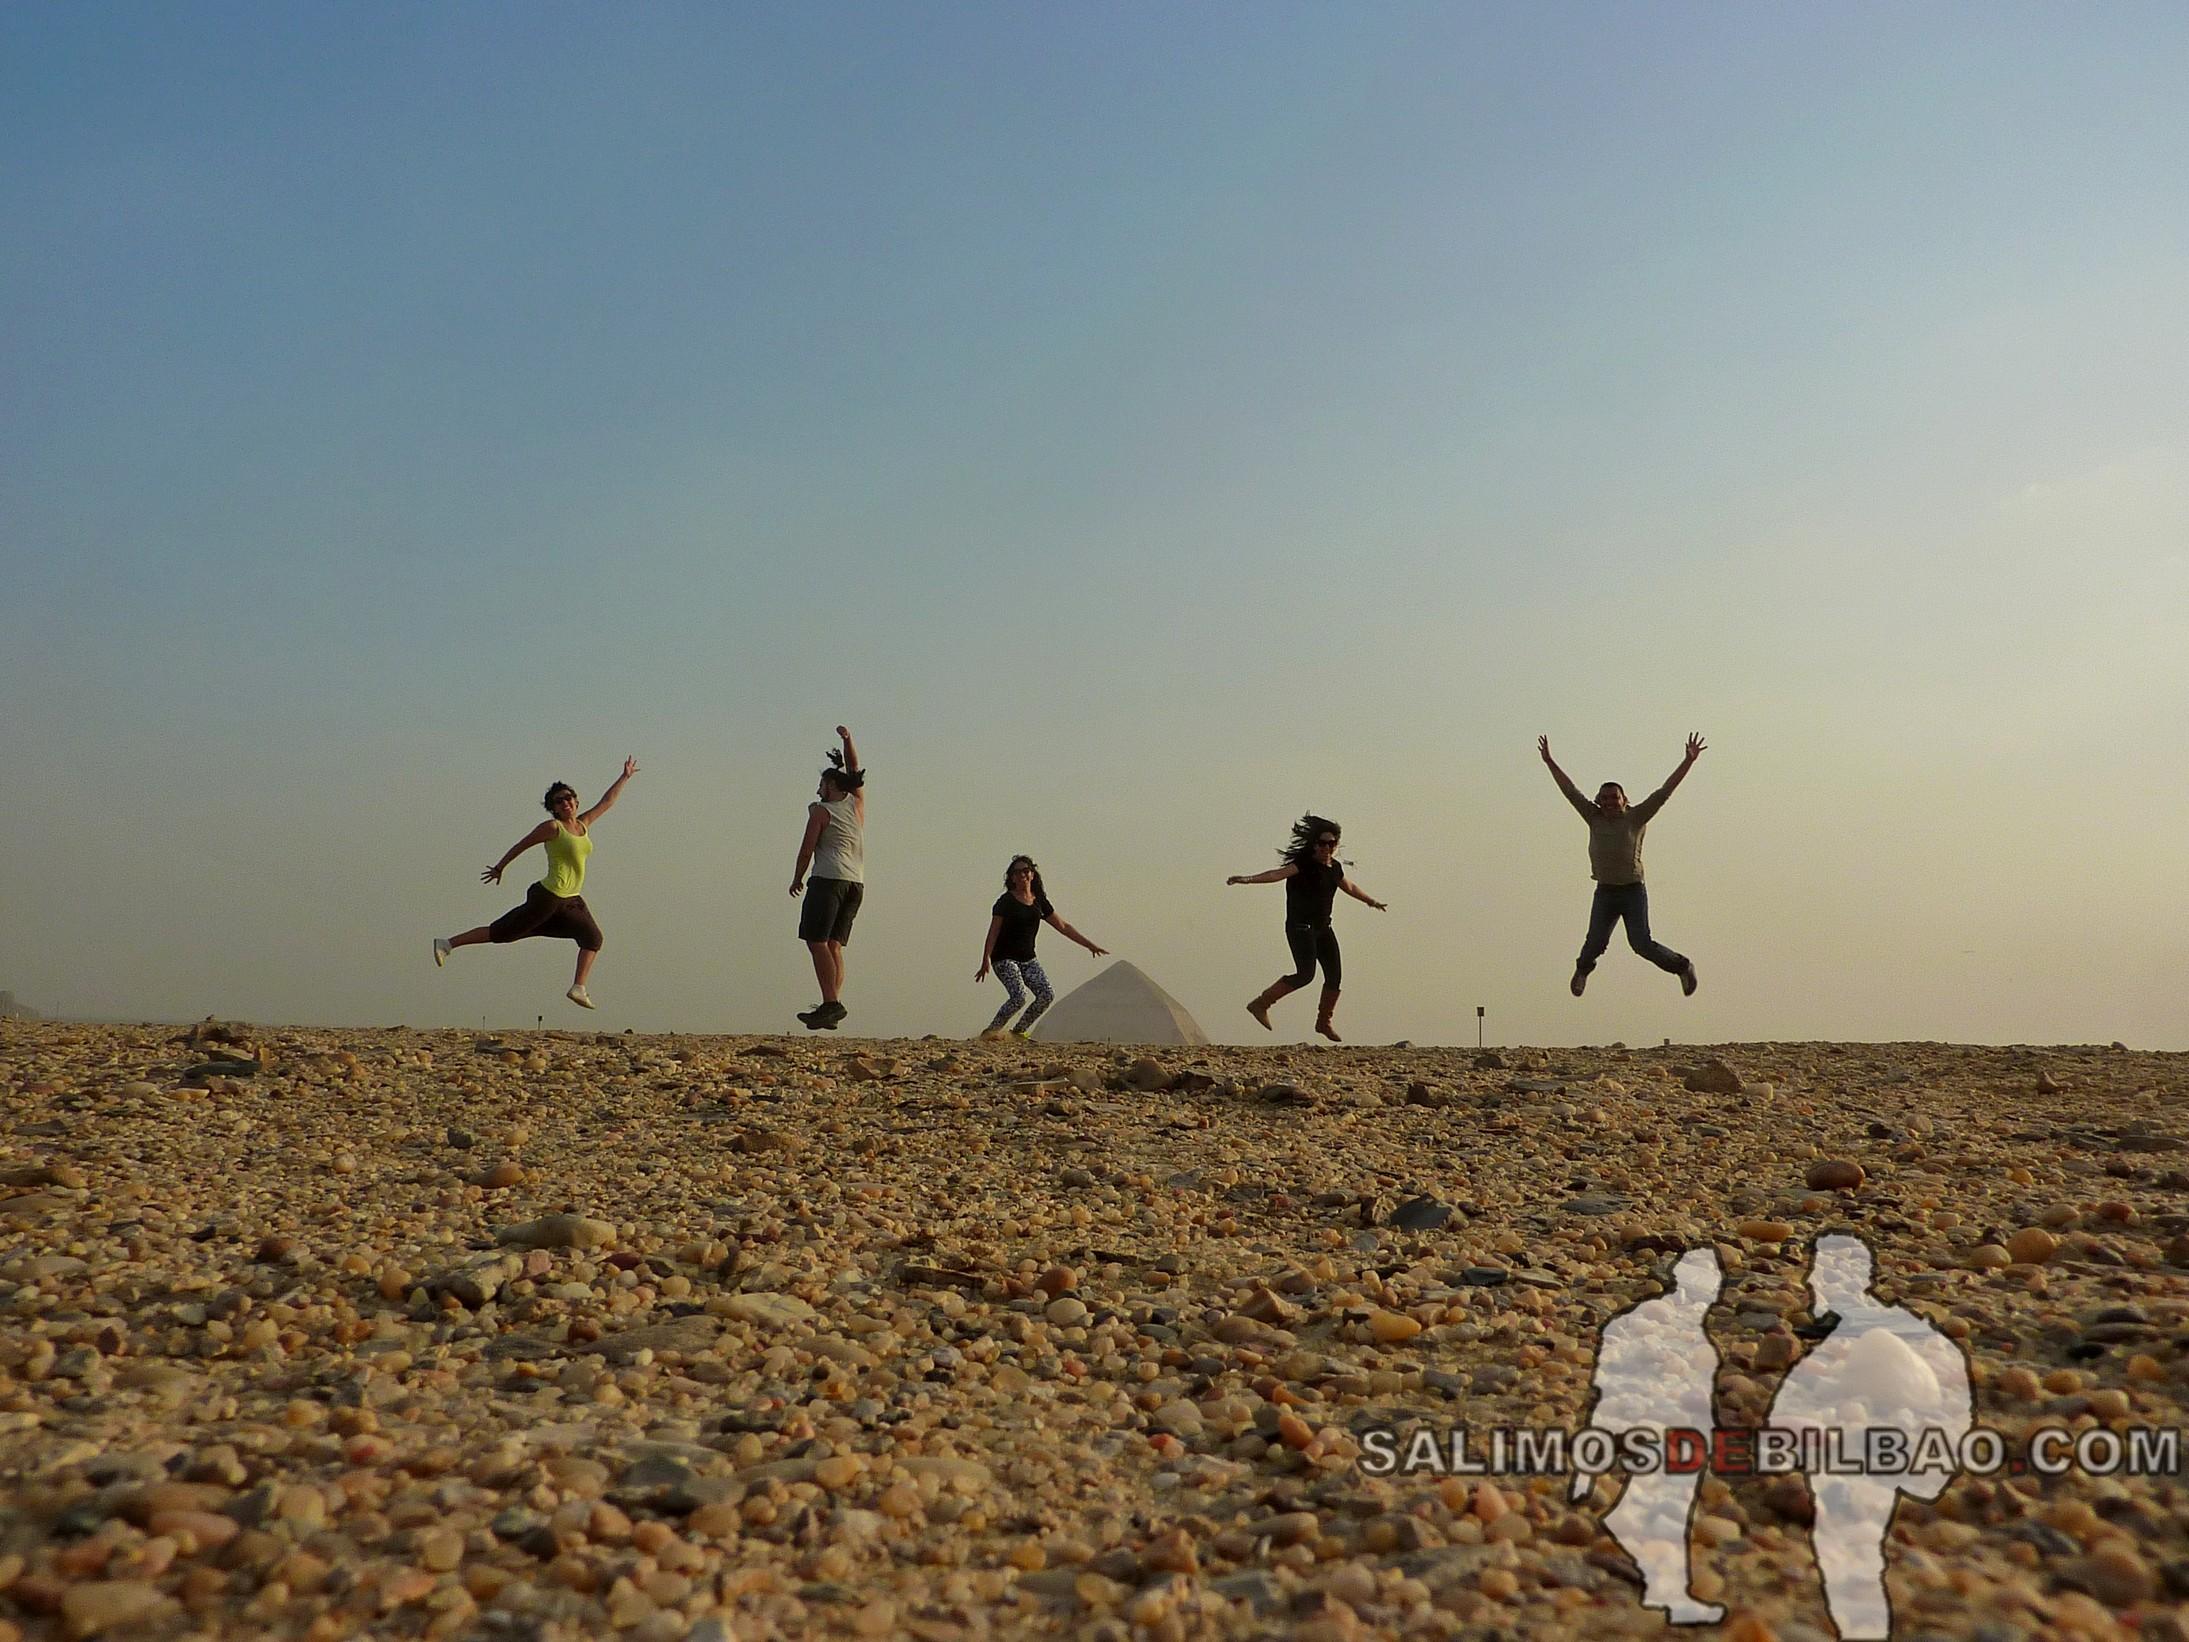 0236. Grupo saltando, Pirámide inclinada de Saqqara